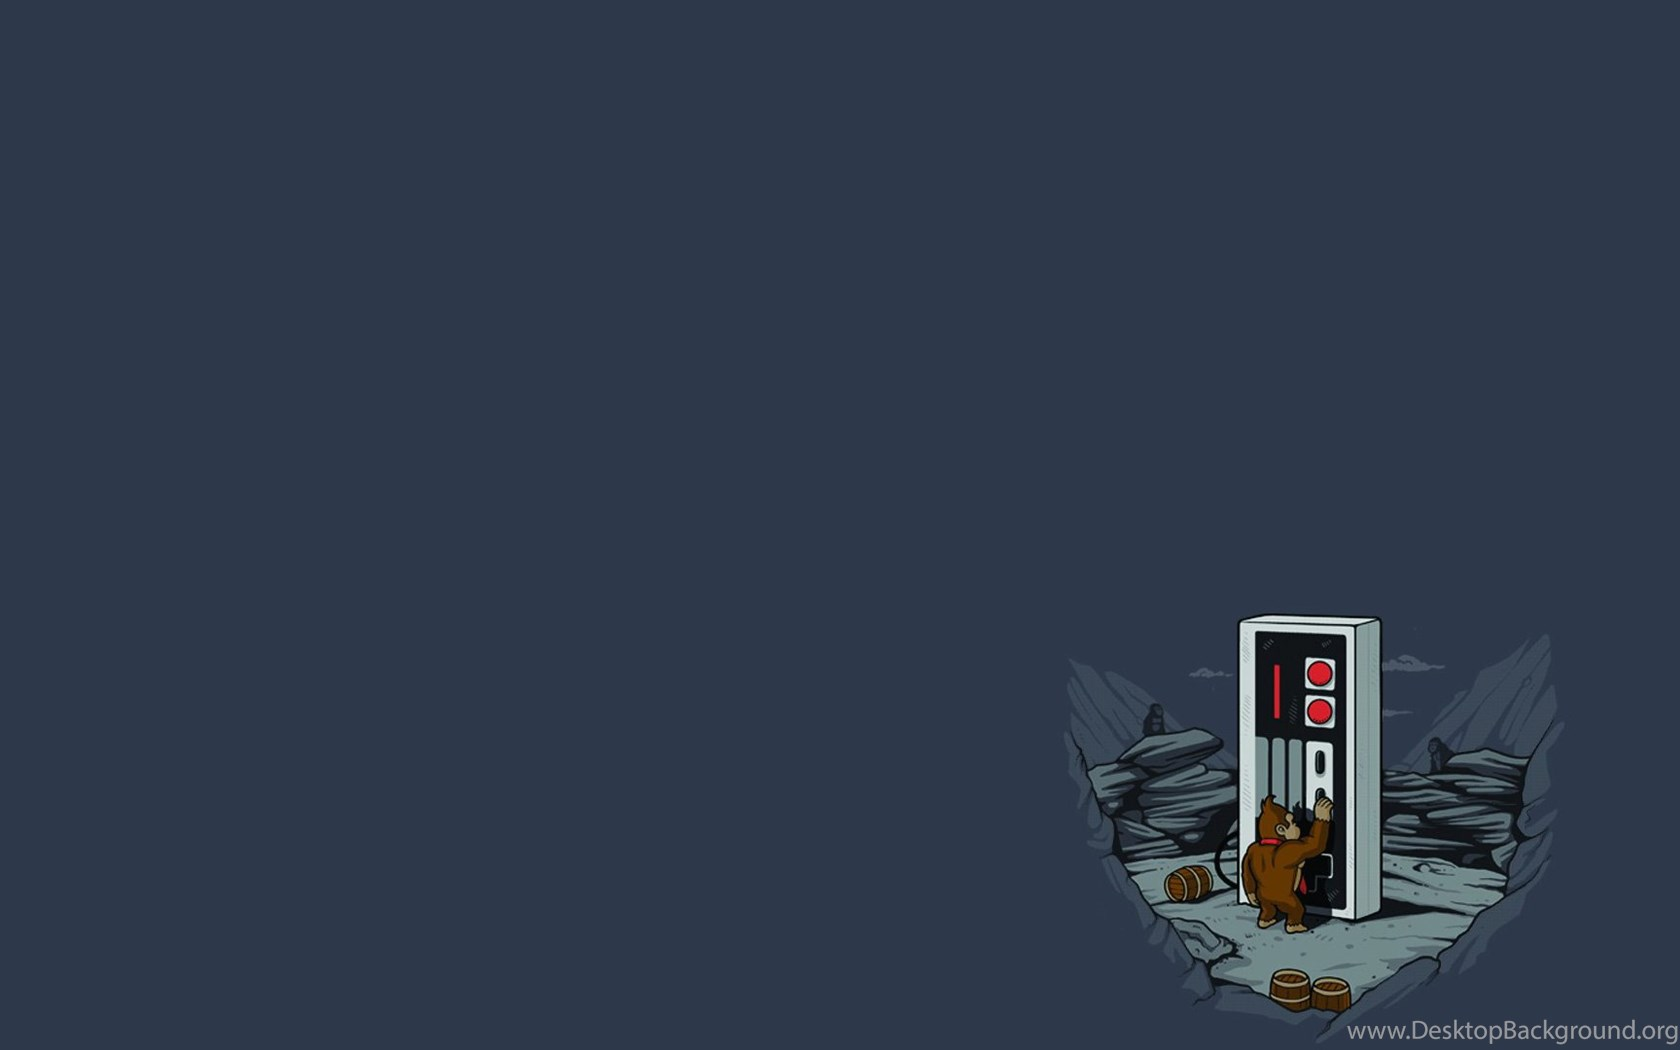 Great Wallpaper Home Screen Donkey Kong - 482384_donkey-kong-playing-nes-hd-wallpapers_1920x1080_h  Image_483122.jpg